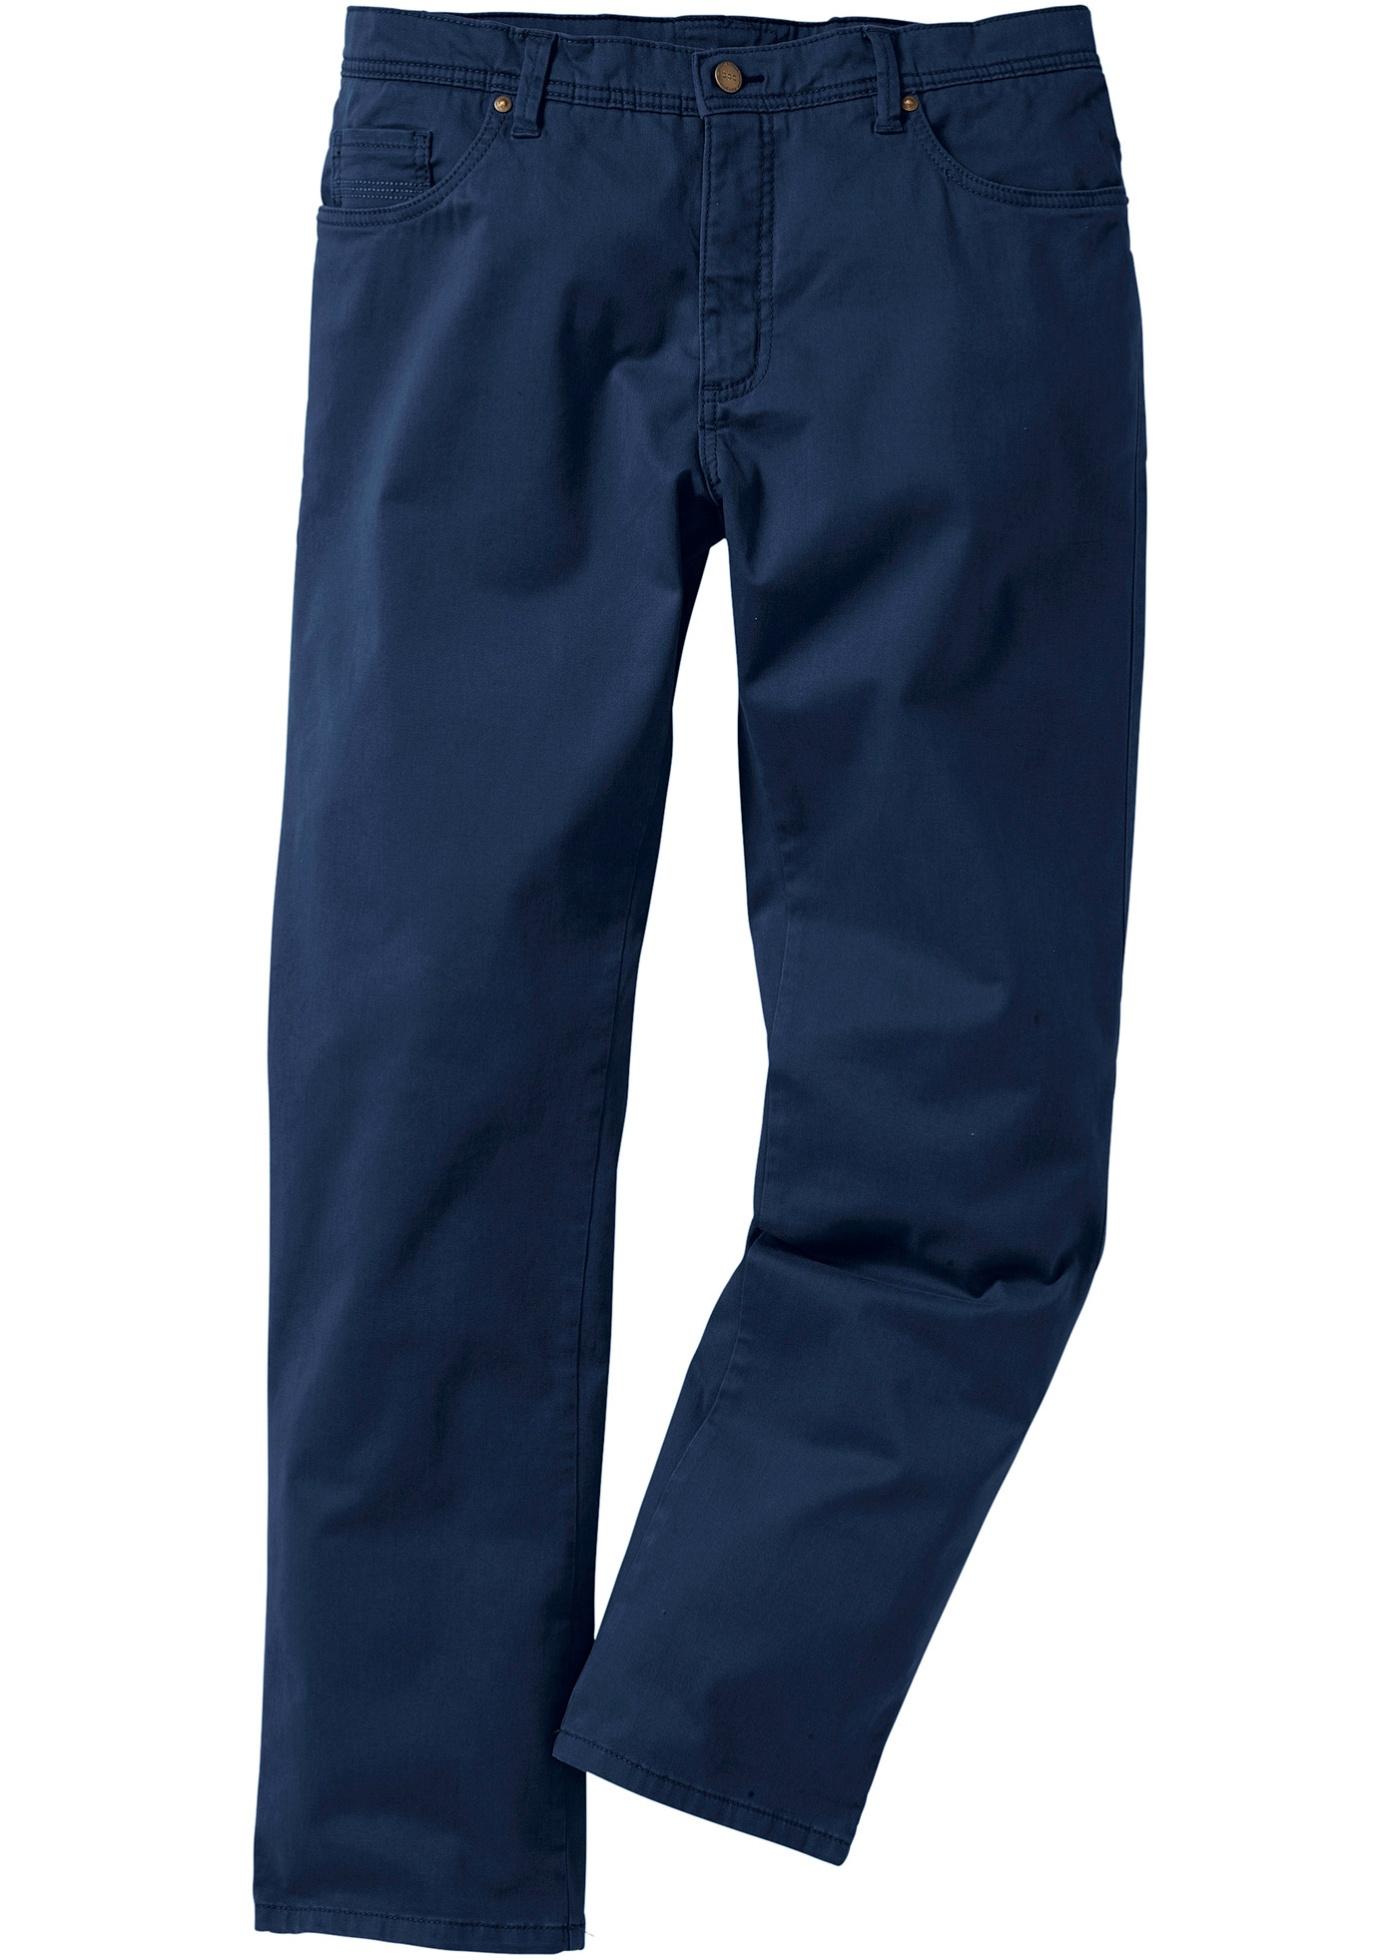 Pantalone 5 tasche elasti